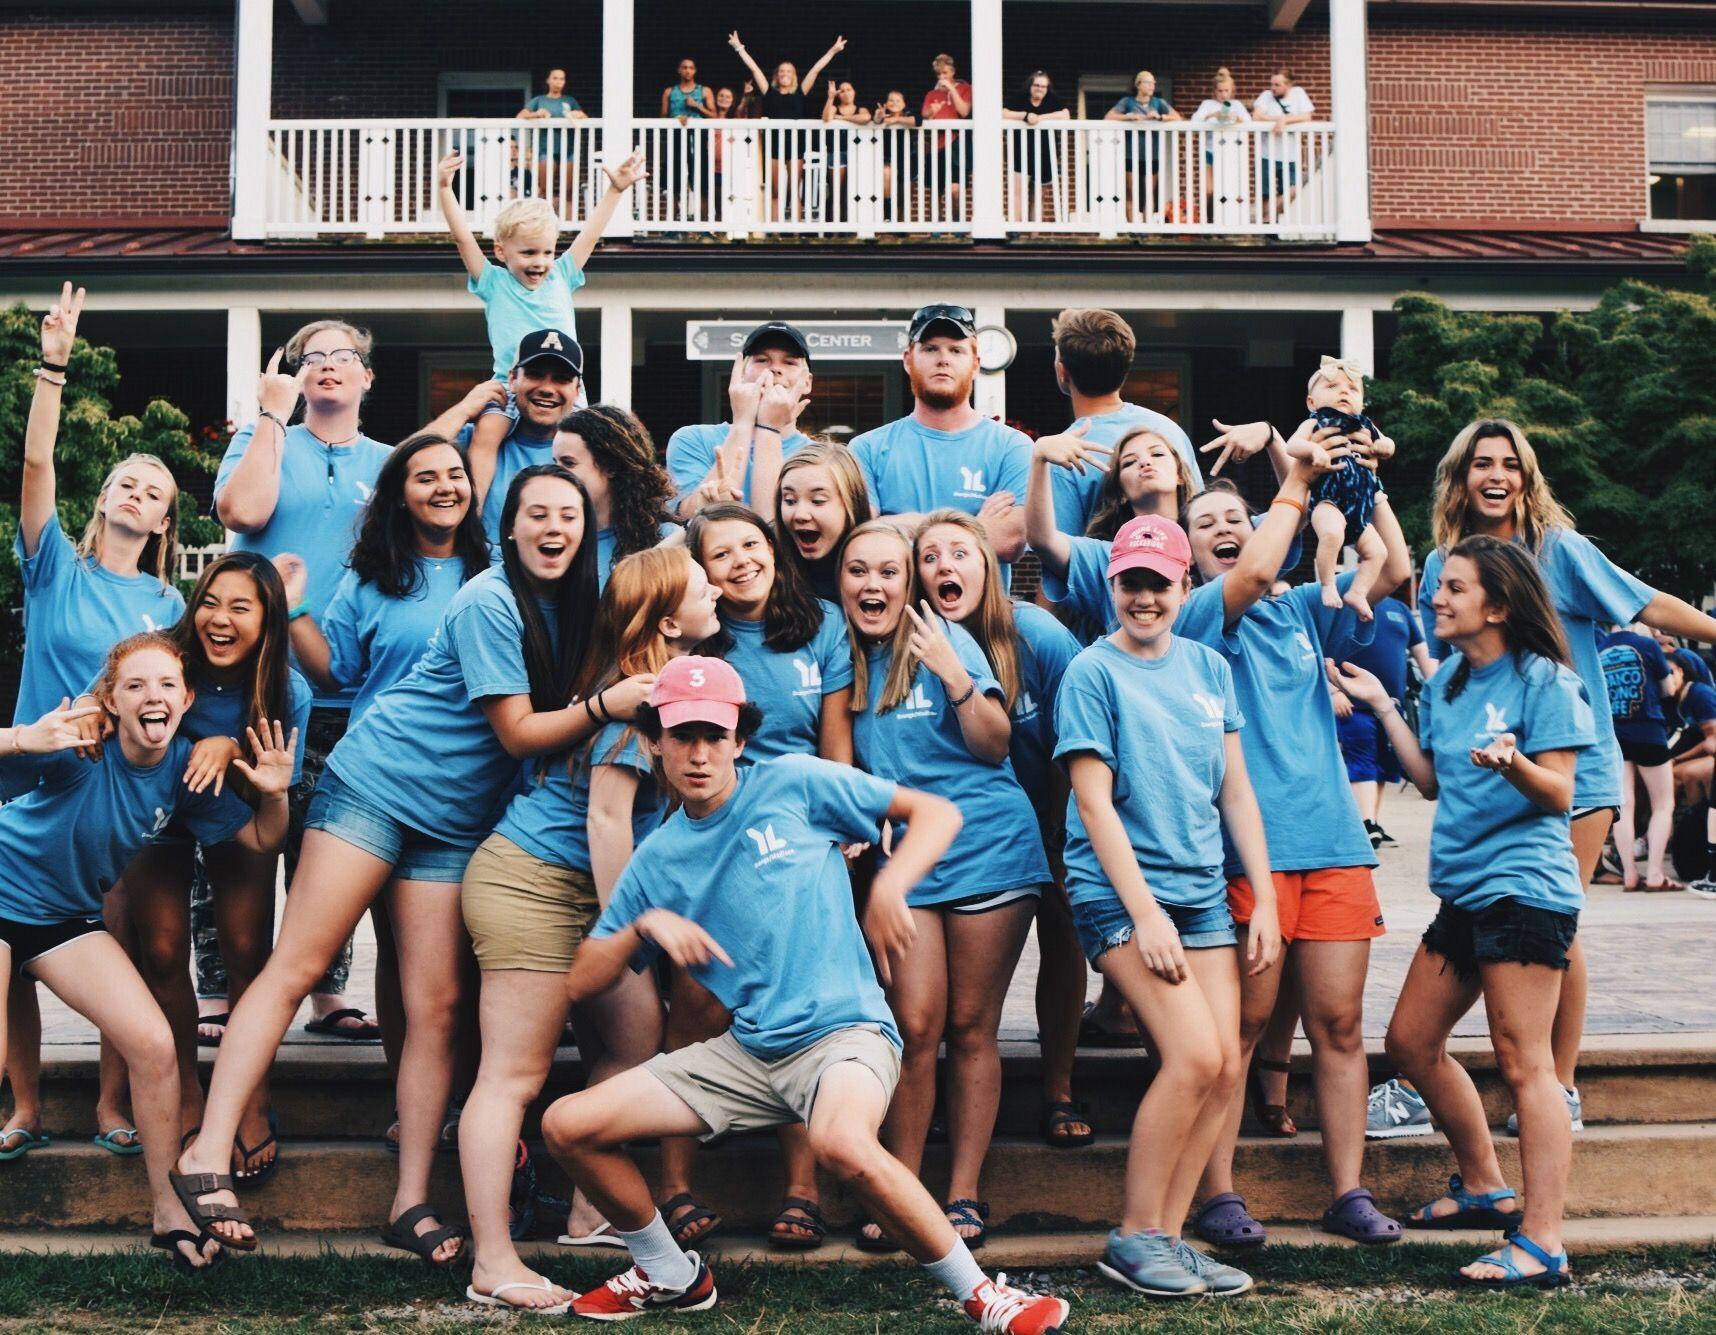 rockbridge - summer camp | Summer camp counselor, Camping ...